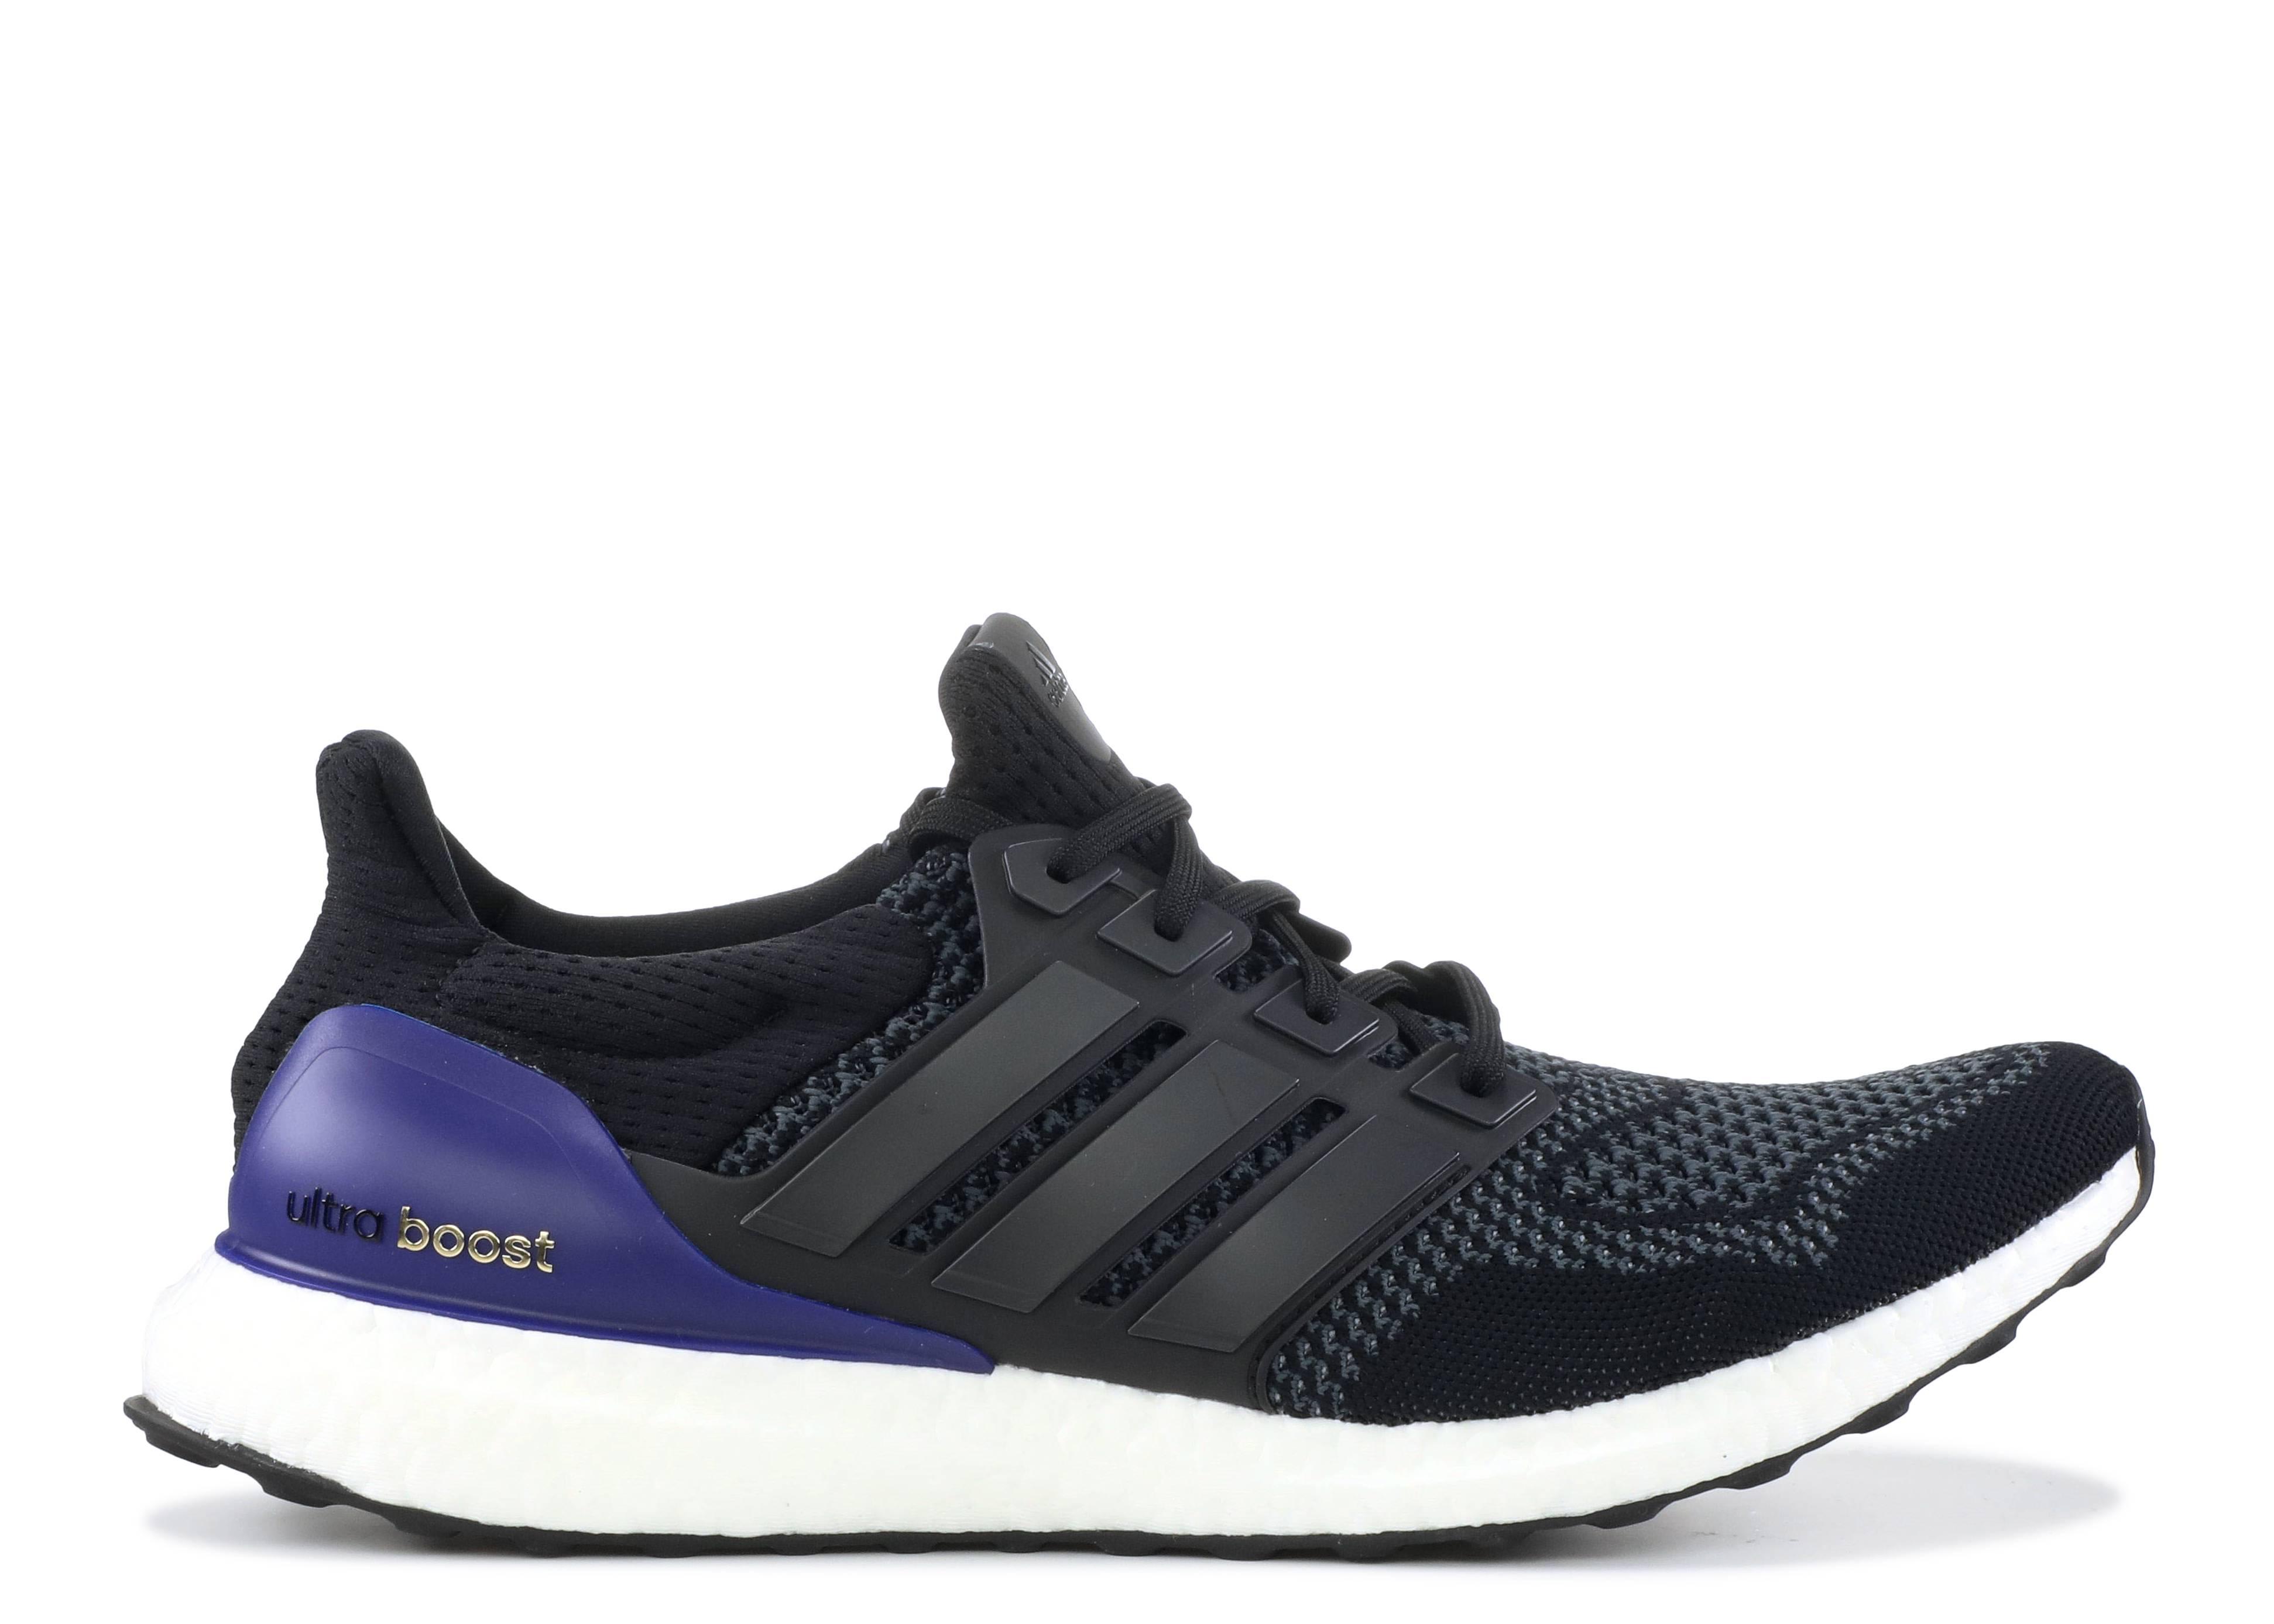 55cad92e4f910 Ultra Boost - Adidas - g28319 - black